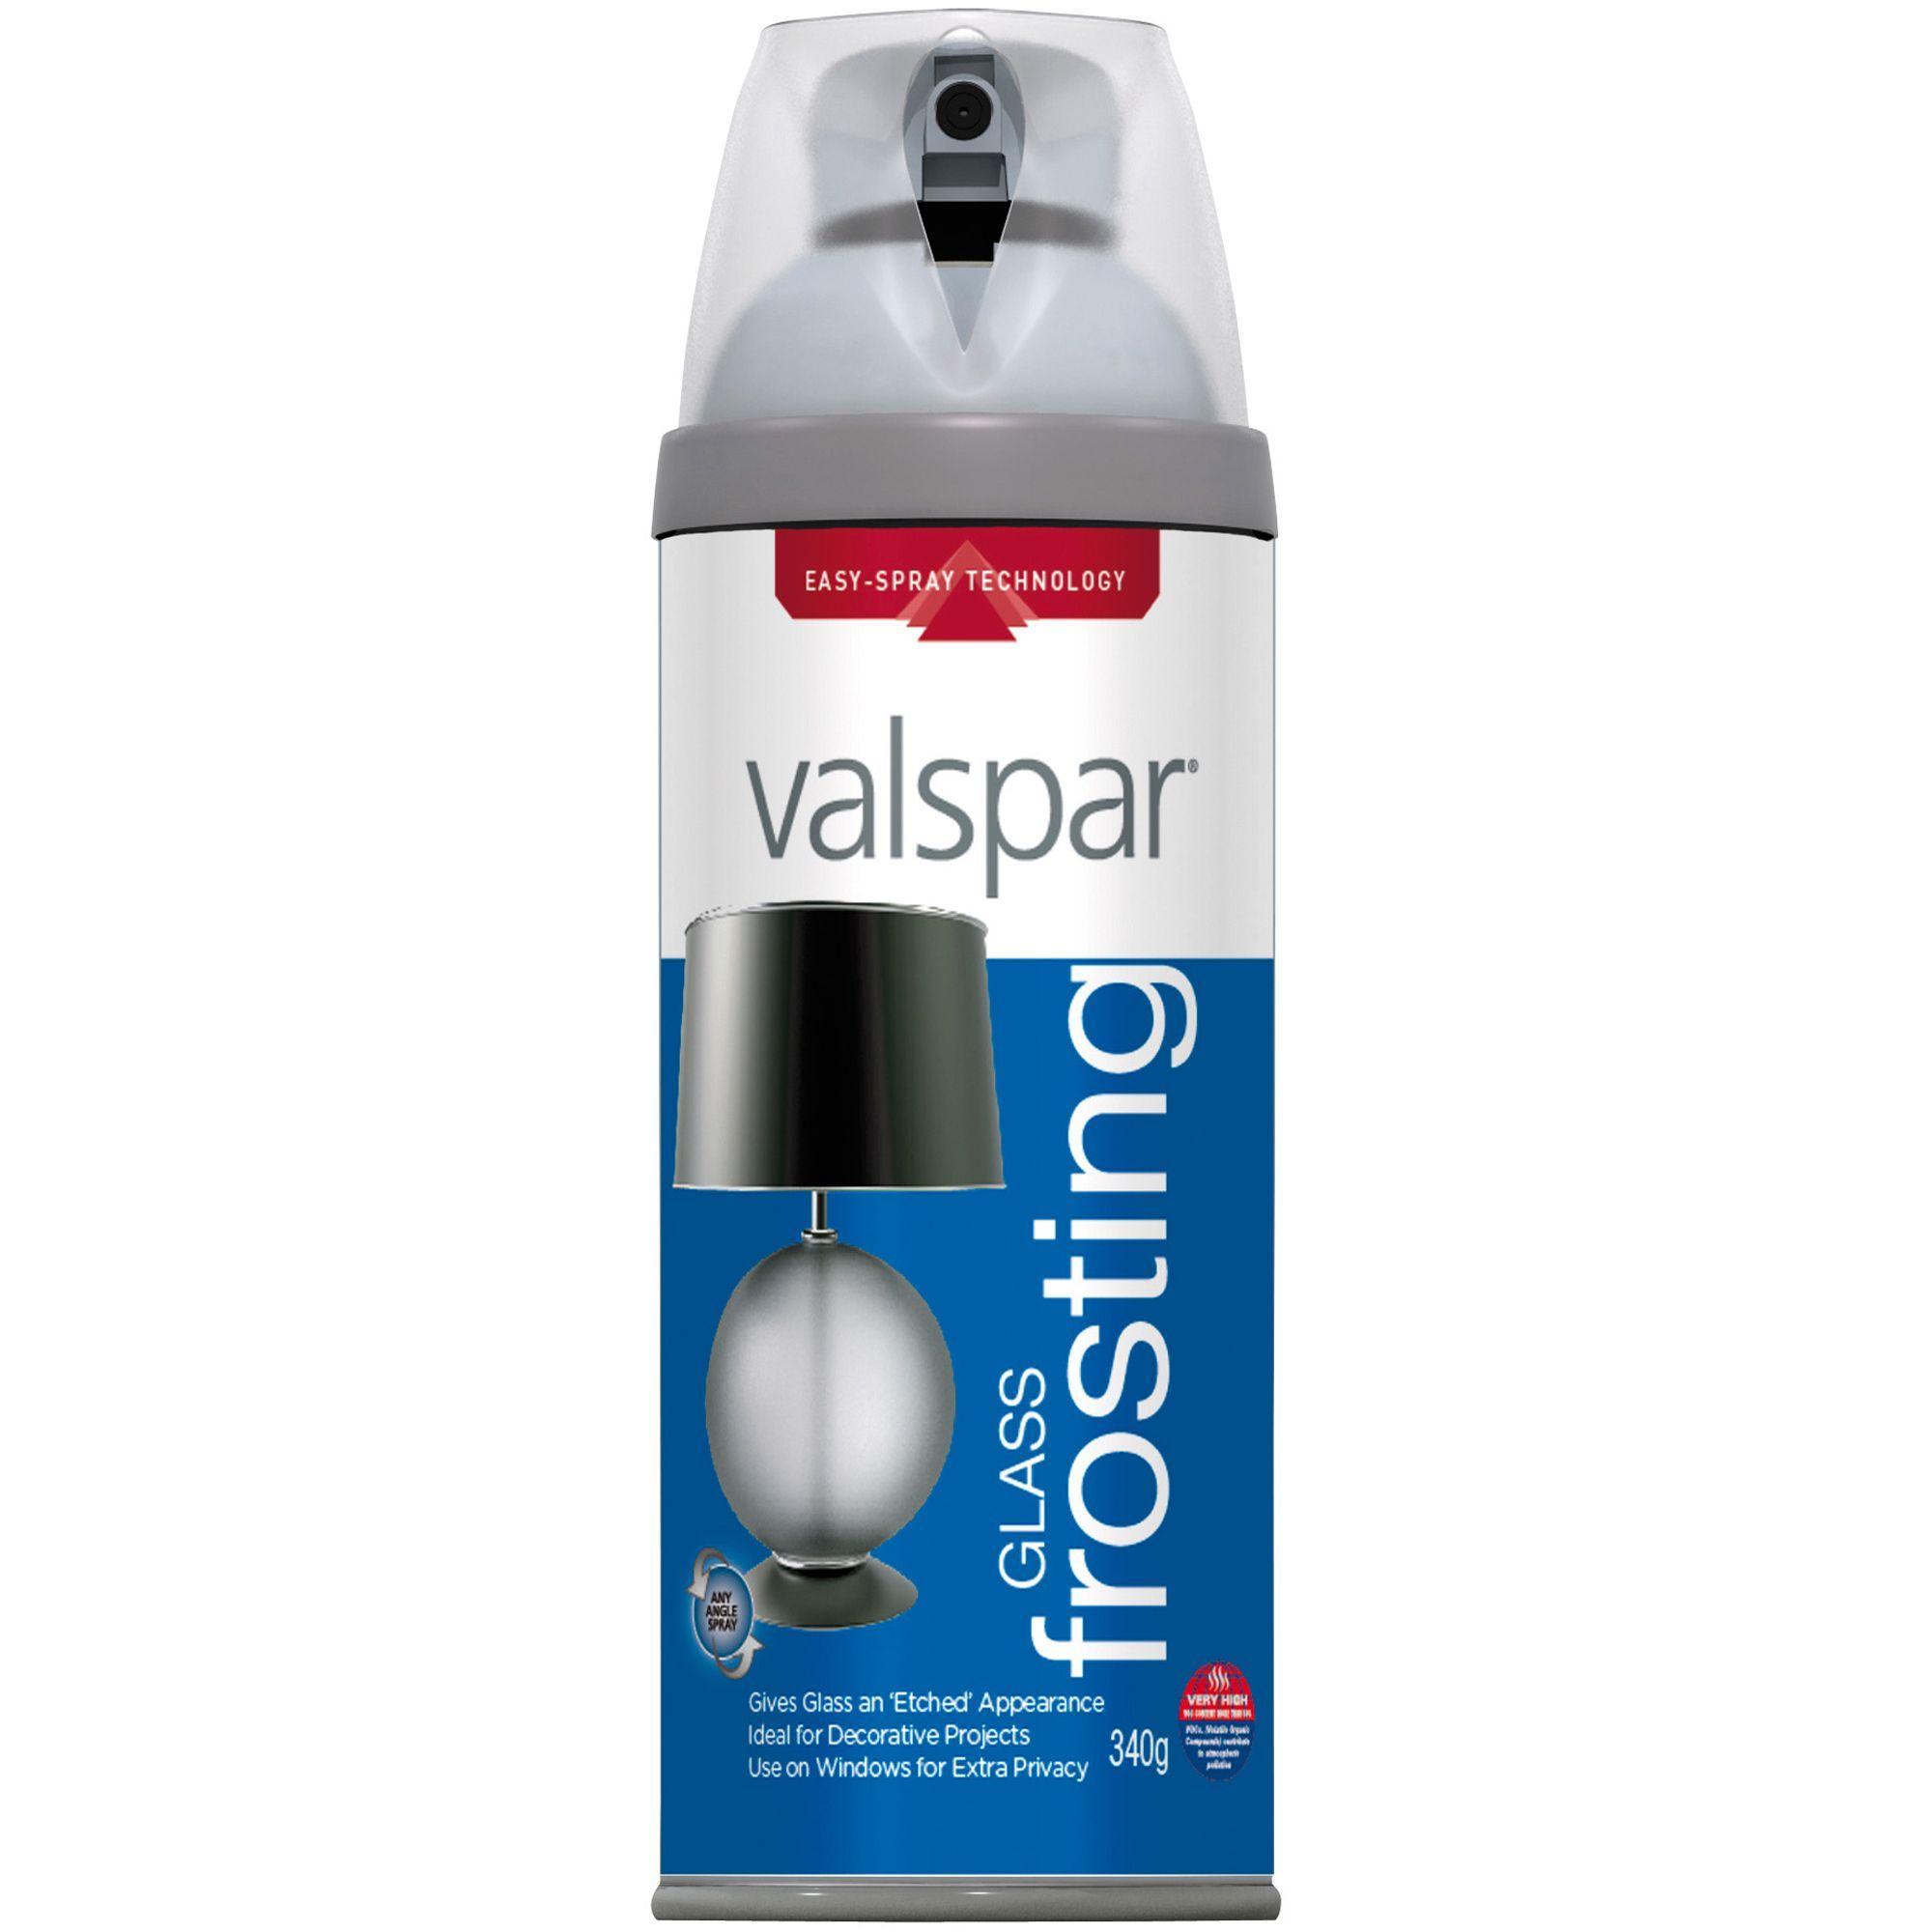 Valspar Glass Frosting Spray Paint 400ml Departments Diy At